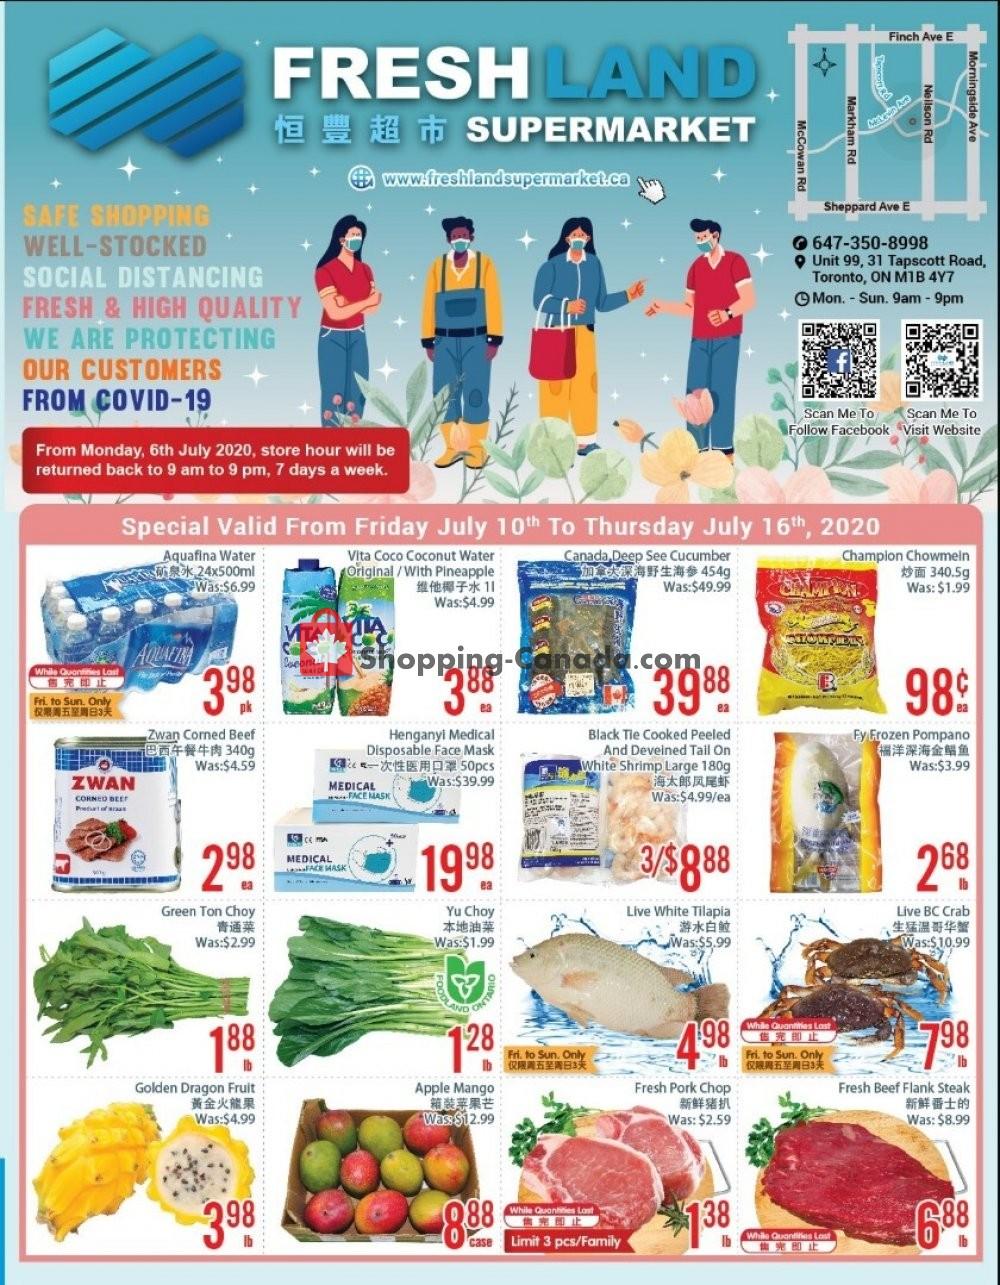 Flyer FreshLand Supermarket Canada - from Friday July 10, 2020 to Thursday July 16, 2020